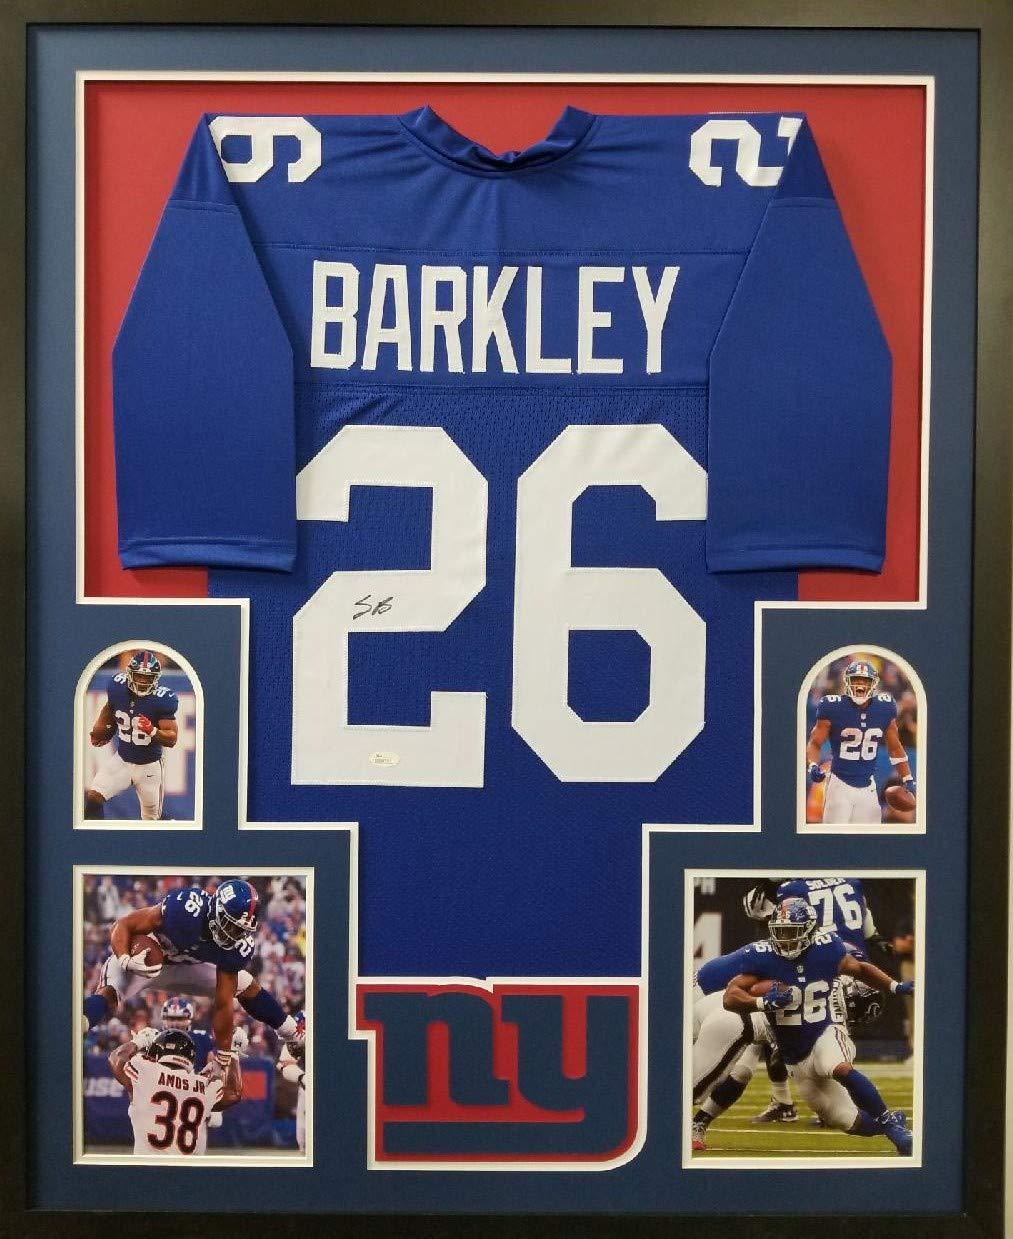 Saquon Barkley New York Giants Signed Autograph FRAMED Custom Jersey JSA Witnessed Certified